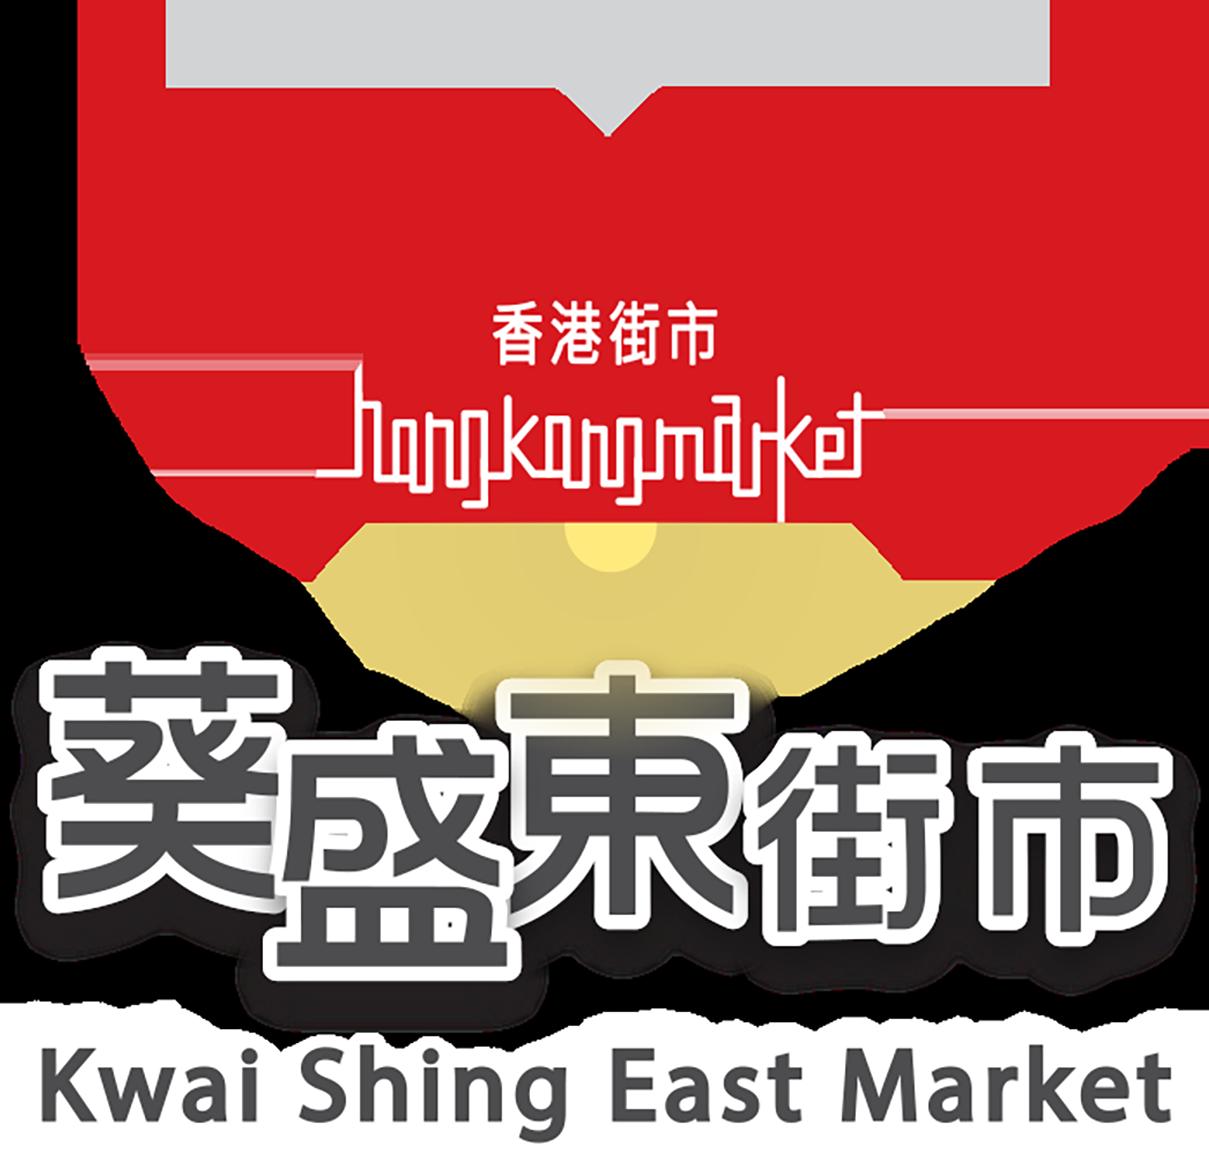 Kwai Shing East Market